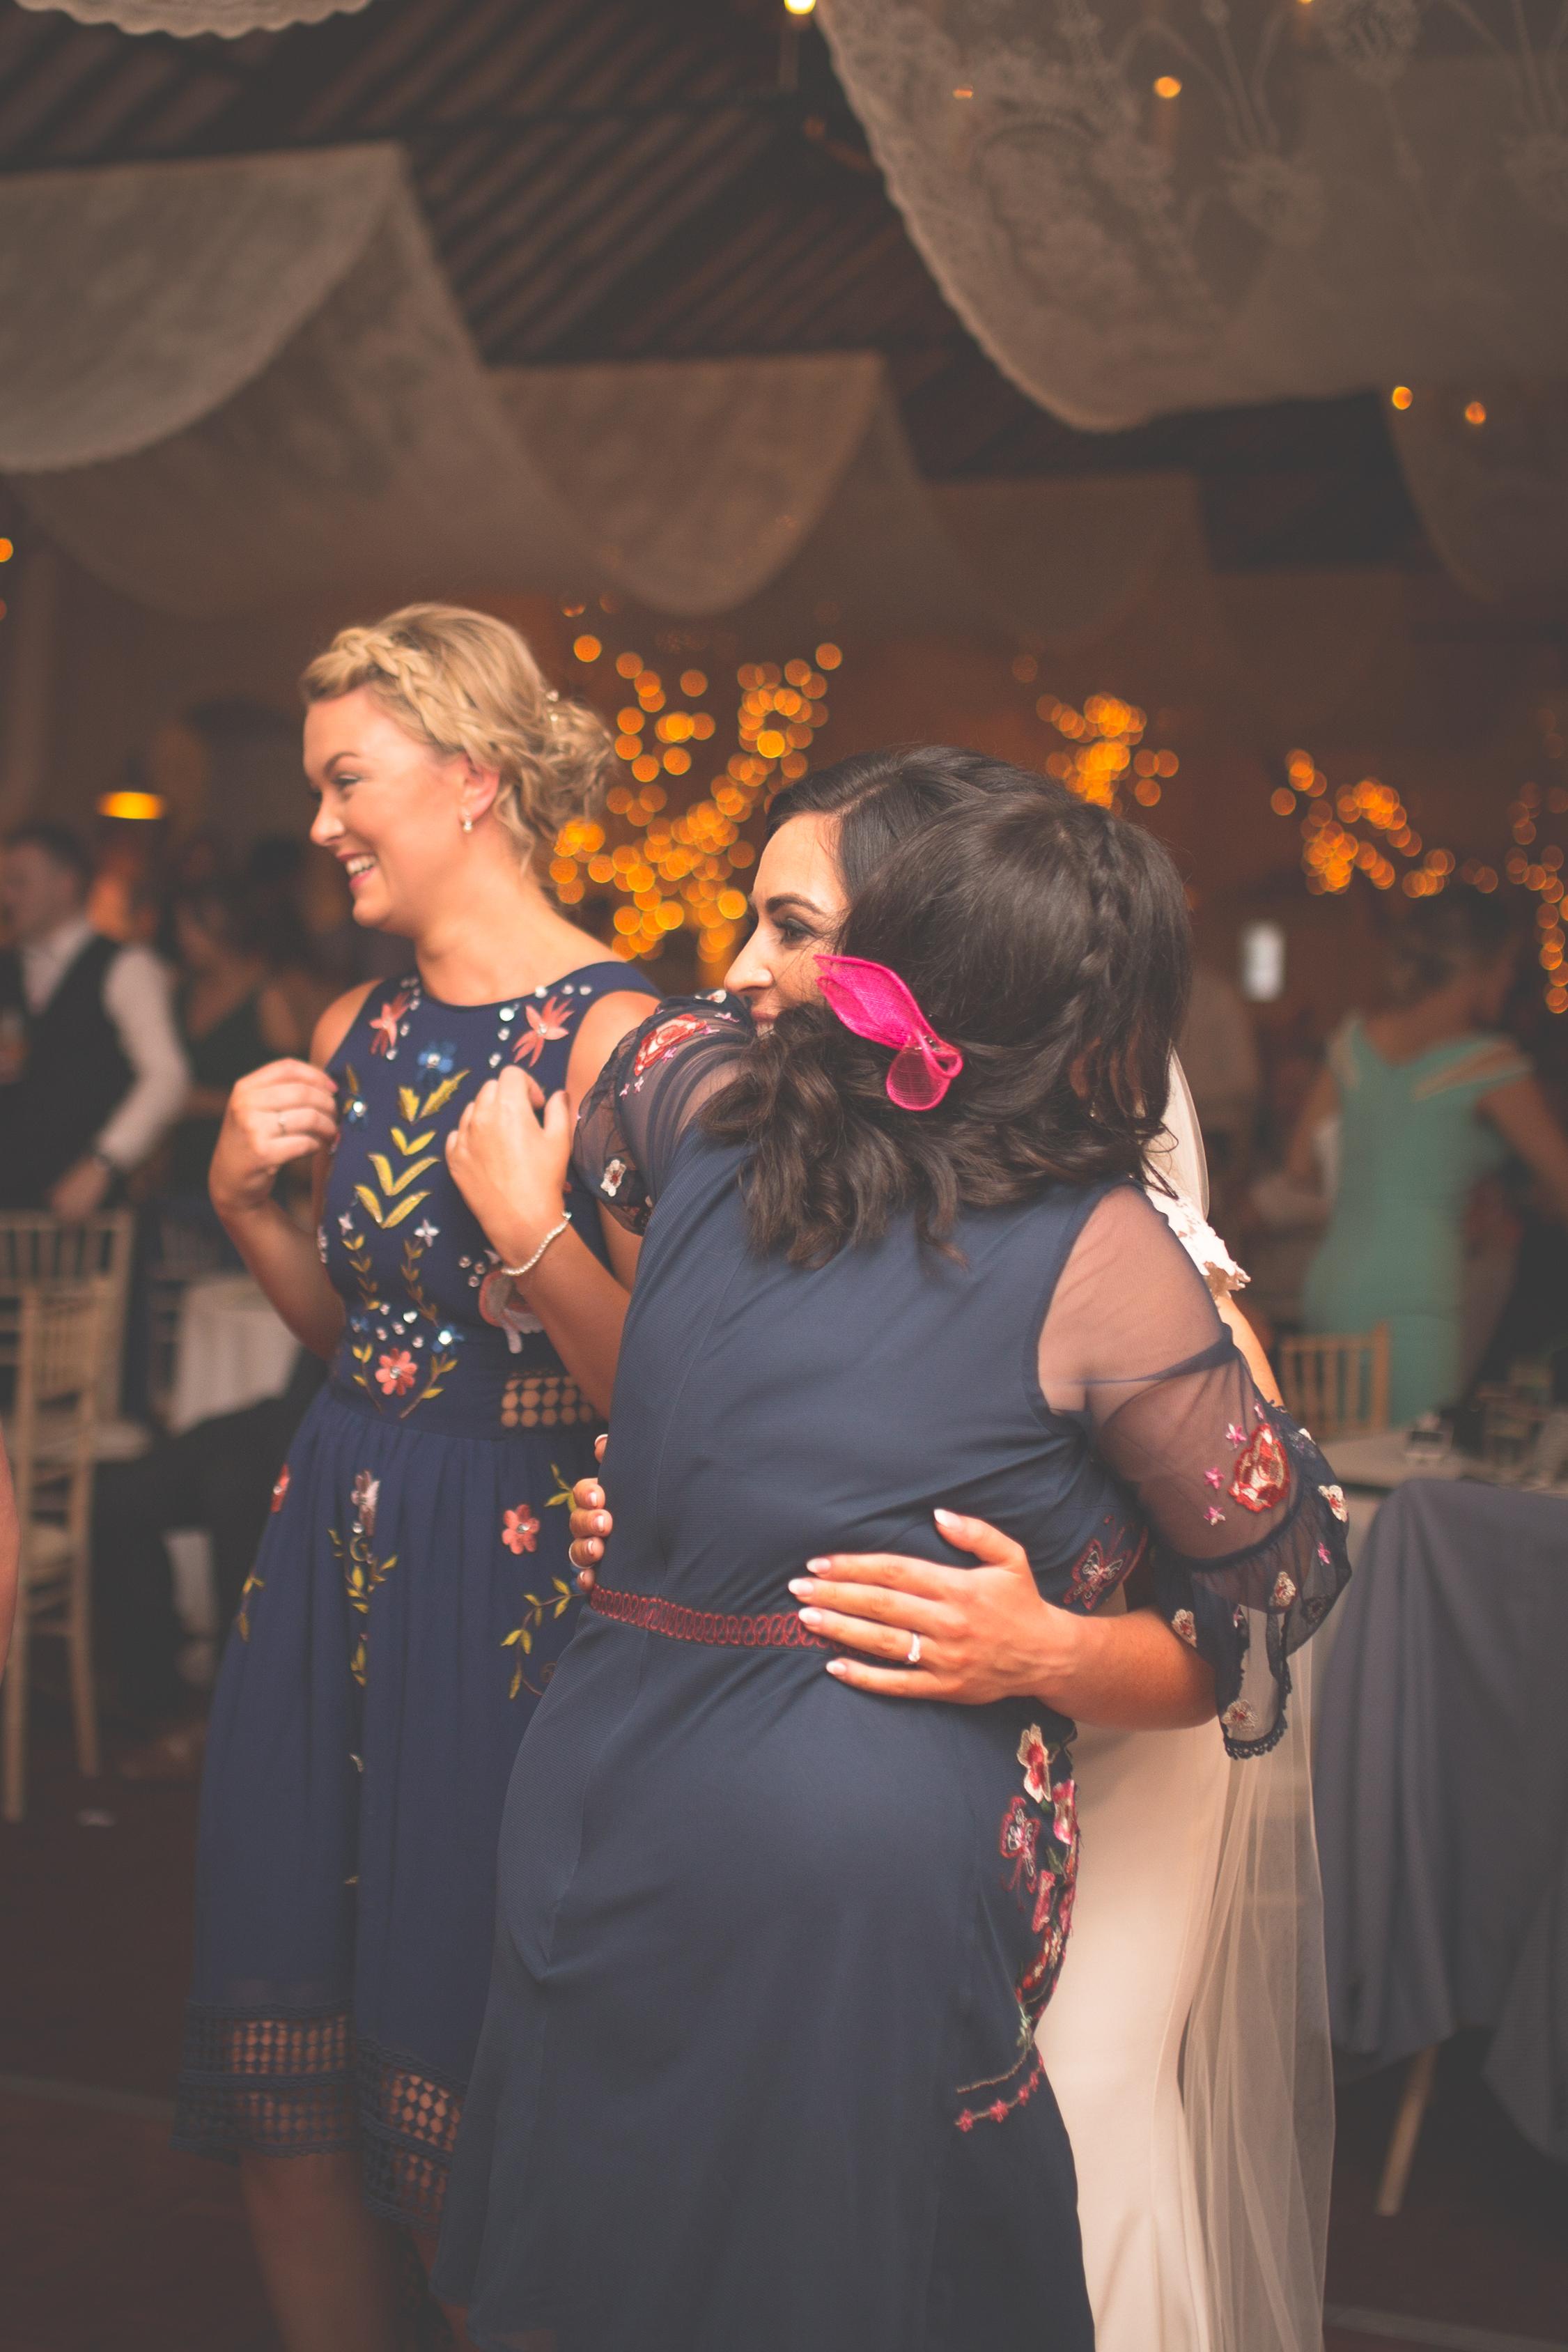 Brian McEwan Wedding Photography | Carol-Annee & Sean | The Dancing-63.jpg